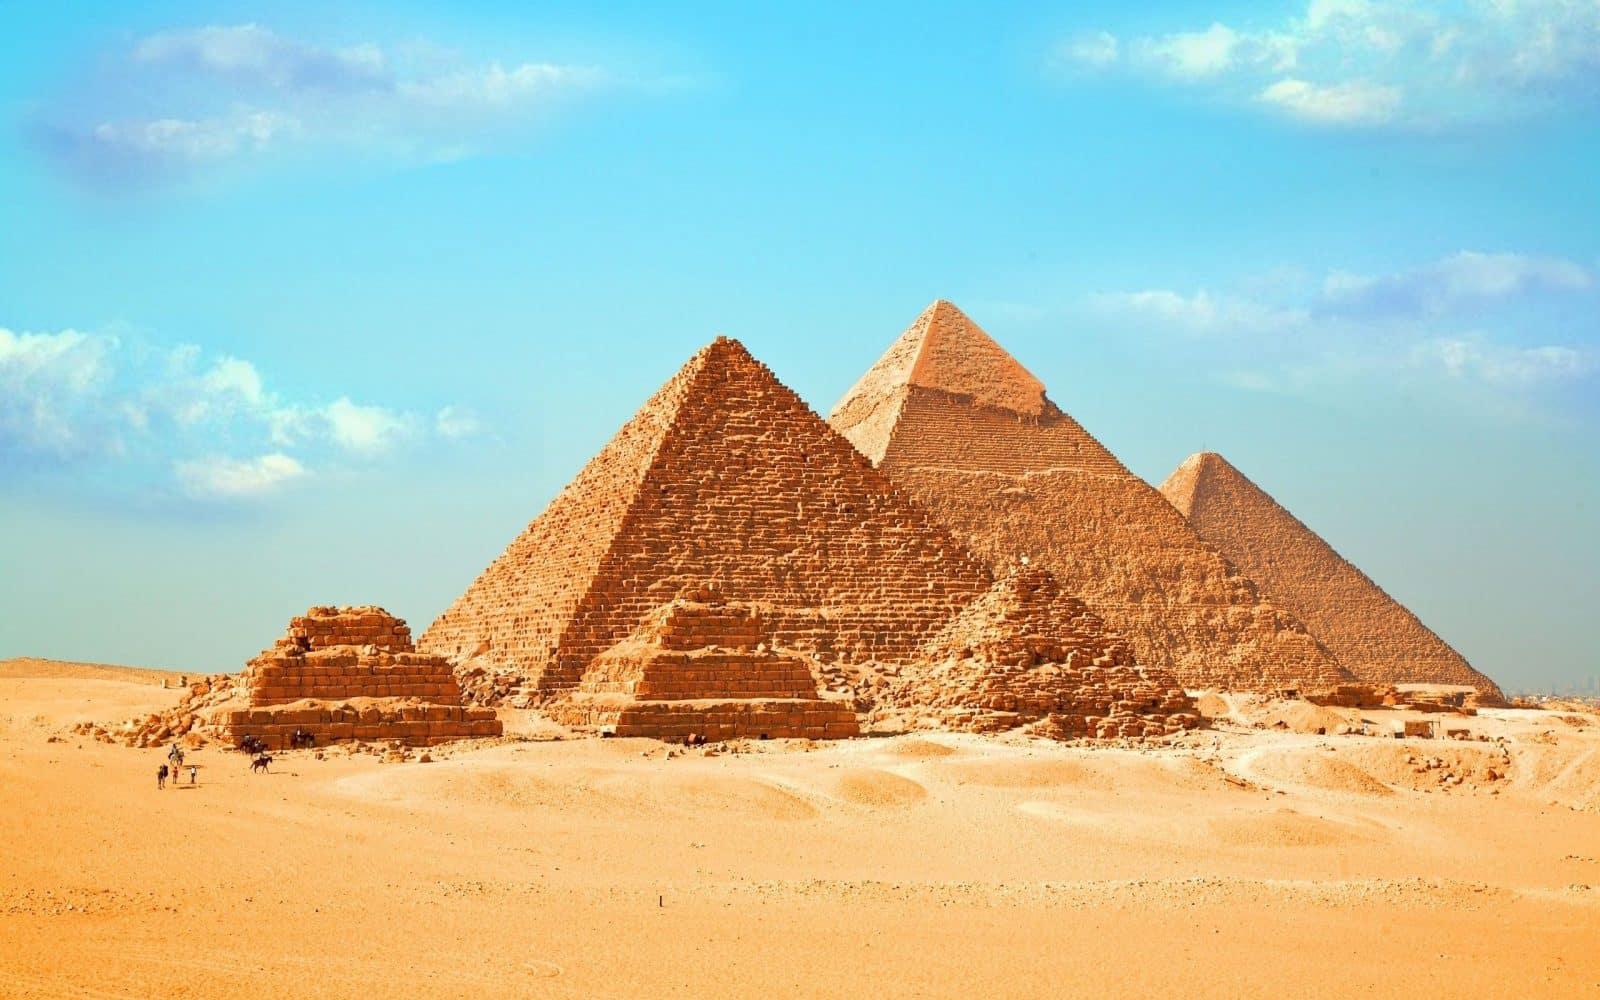 Giza Pyramids - Egypt Destinations - Trips In Egypt